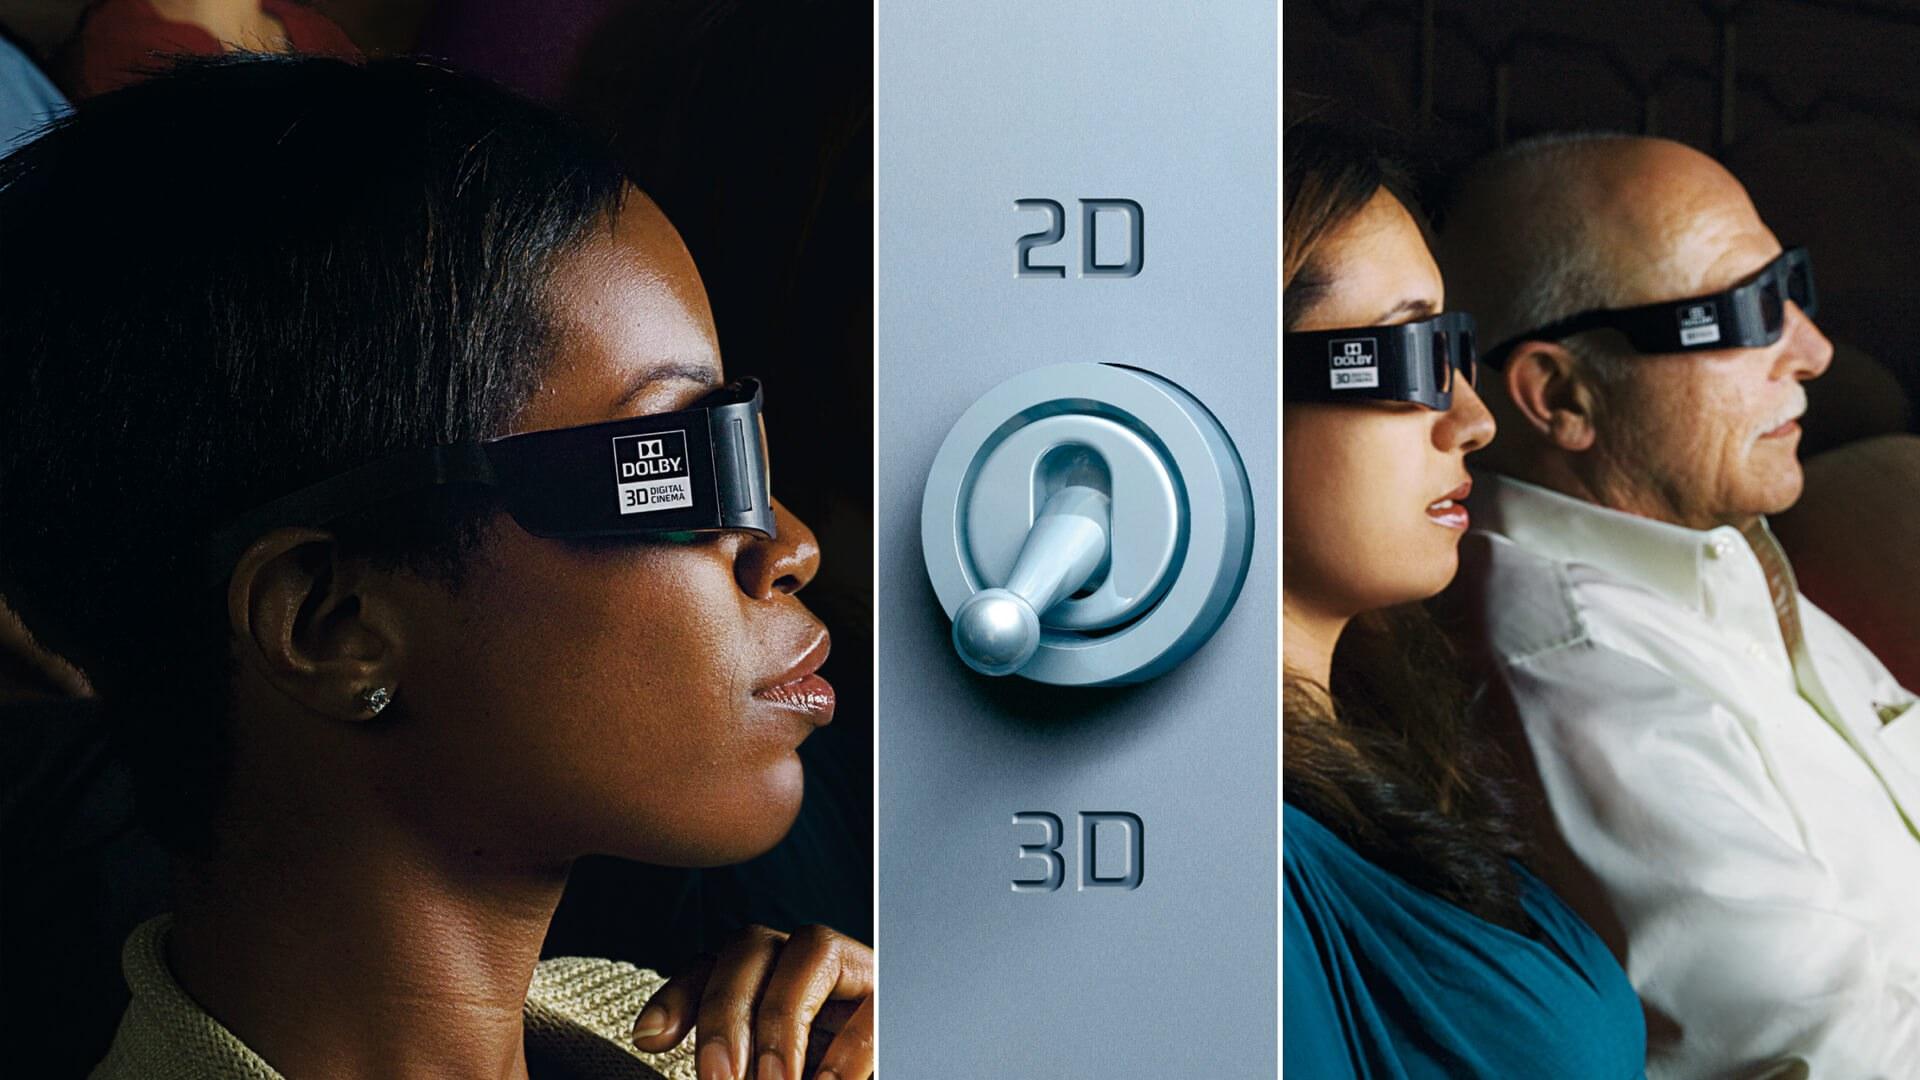 2d 3d dolby digital cinema